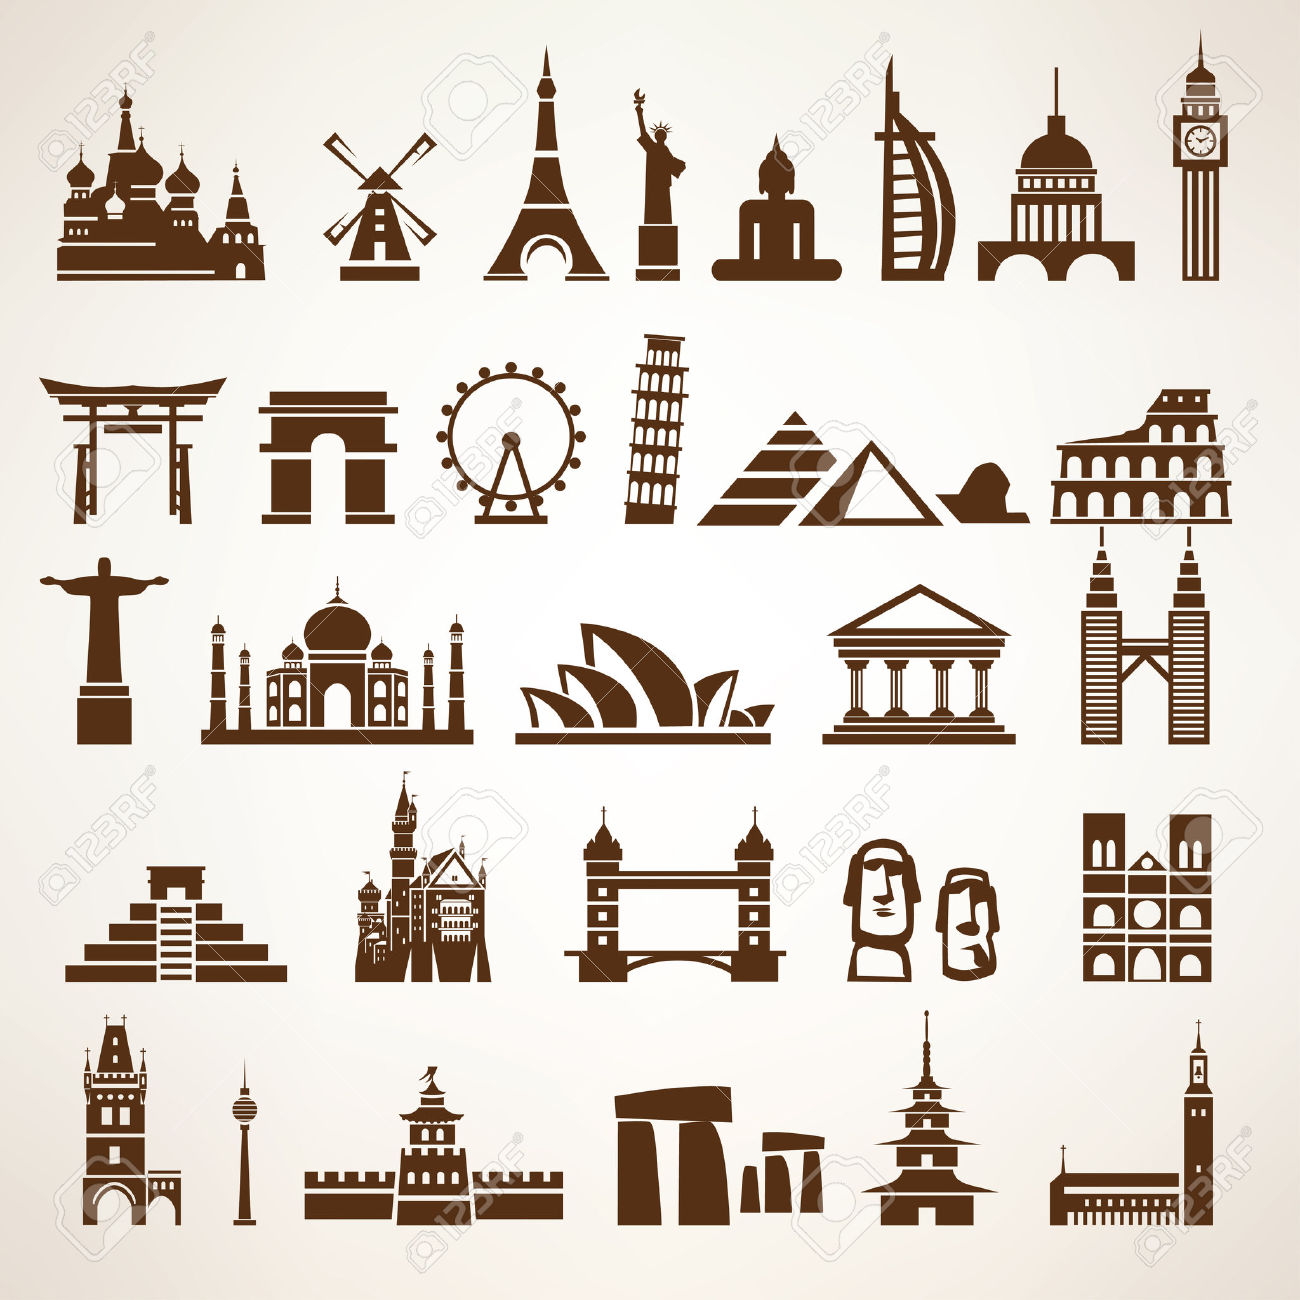 Big Set Of World Landmarks And Historic Buildings Vector.